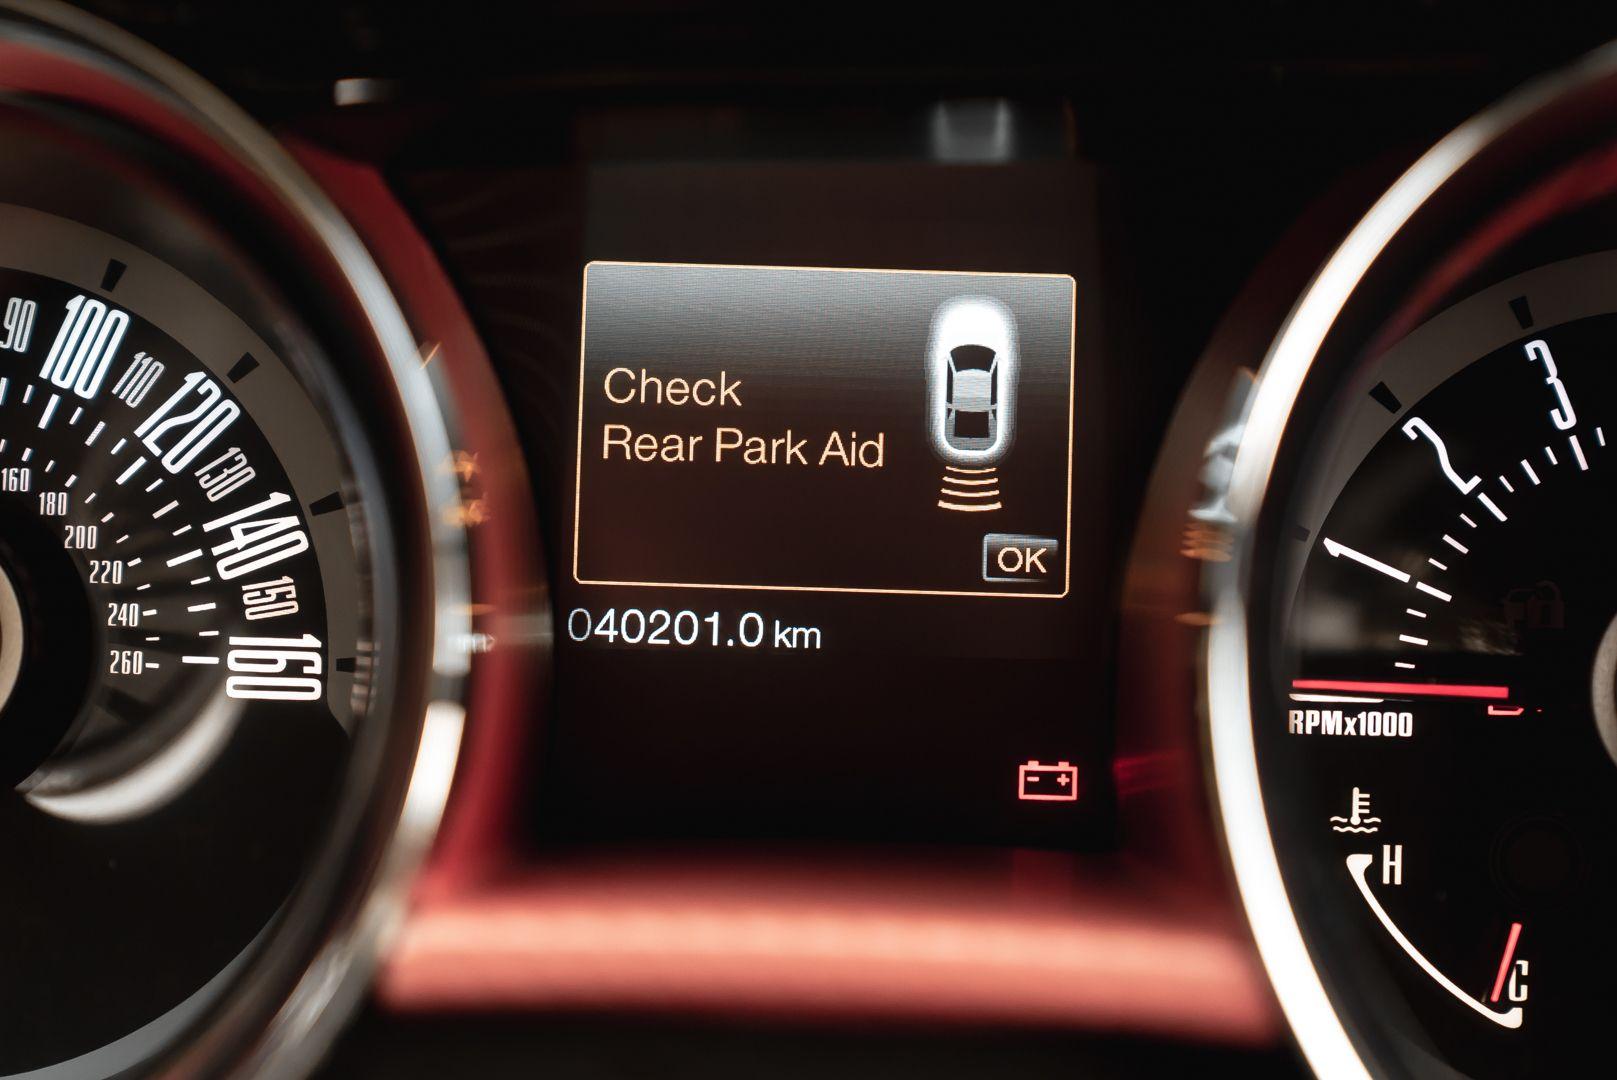 2012 Ford Mustang 5.0 V8 82100